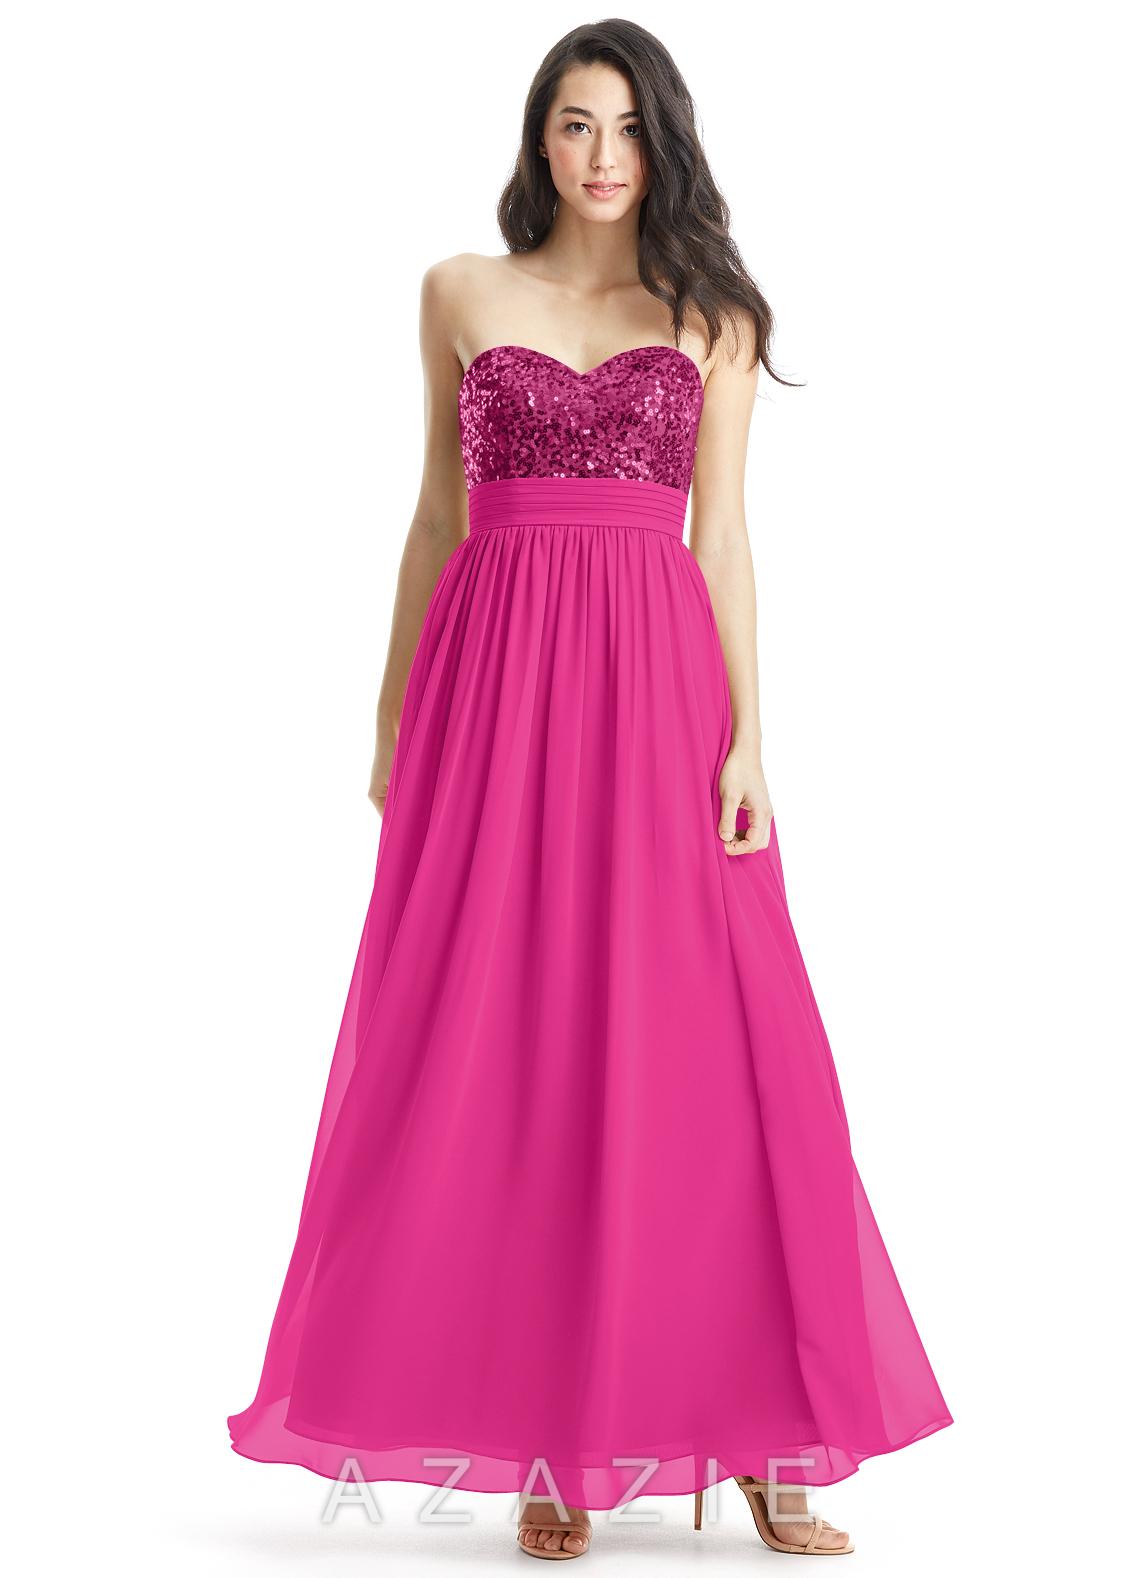 Azazie lucy bridesmaid dress azazie color fuchsia ombrellifo Choice Image